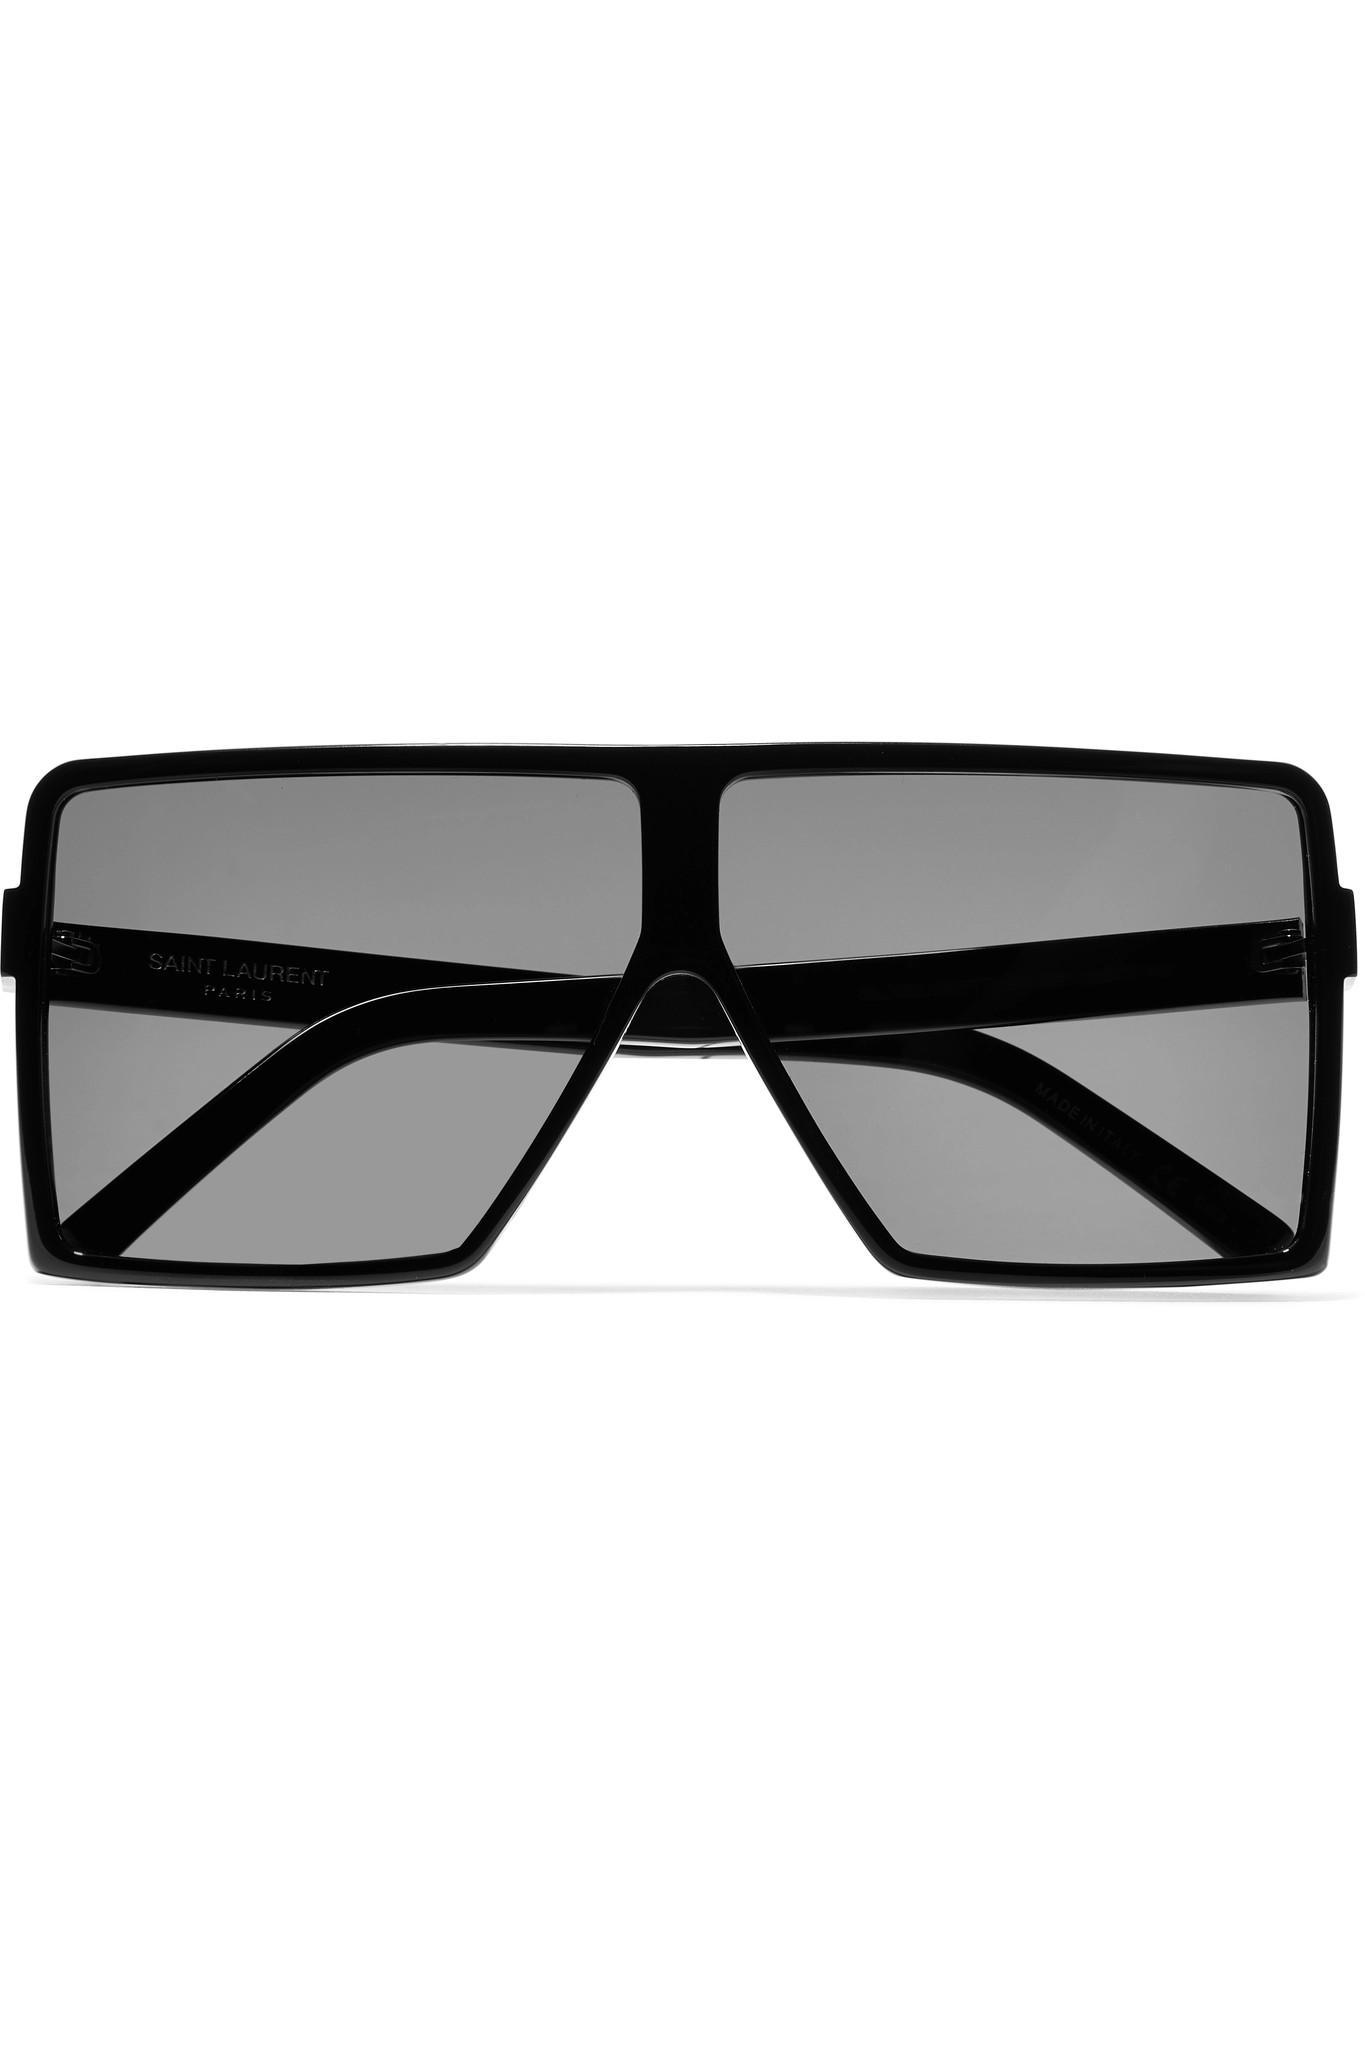 88aff7424d ... Black Betty D-frame Acetate Sunglasses - Lyst. View fullscreen